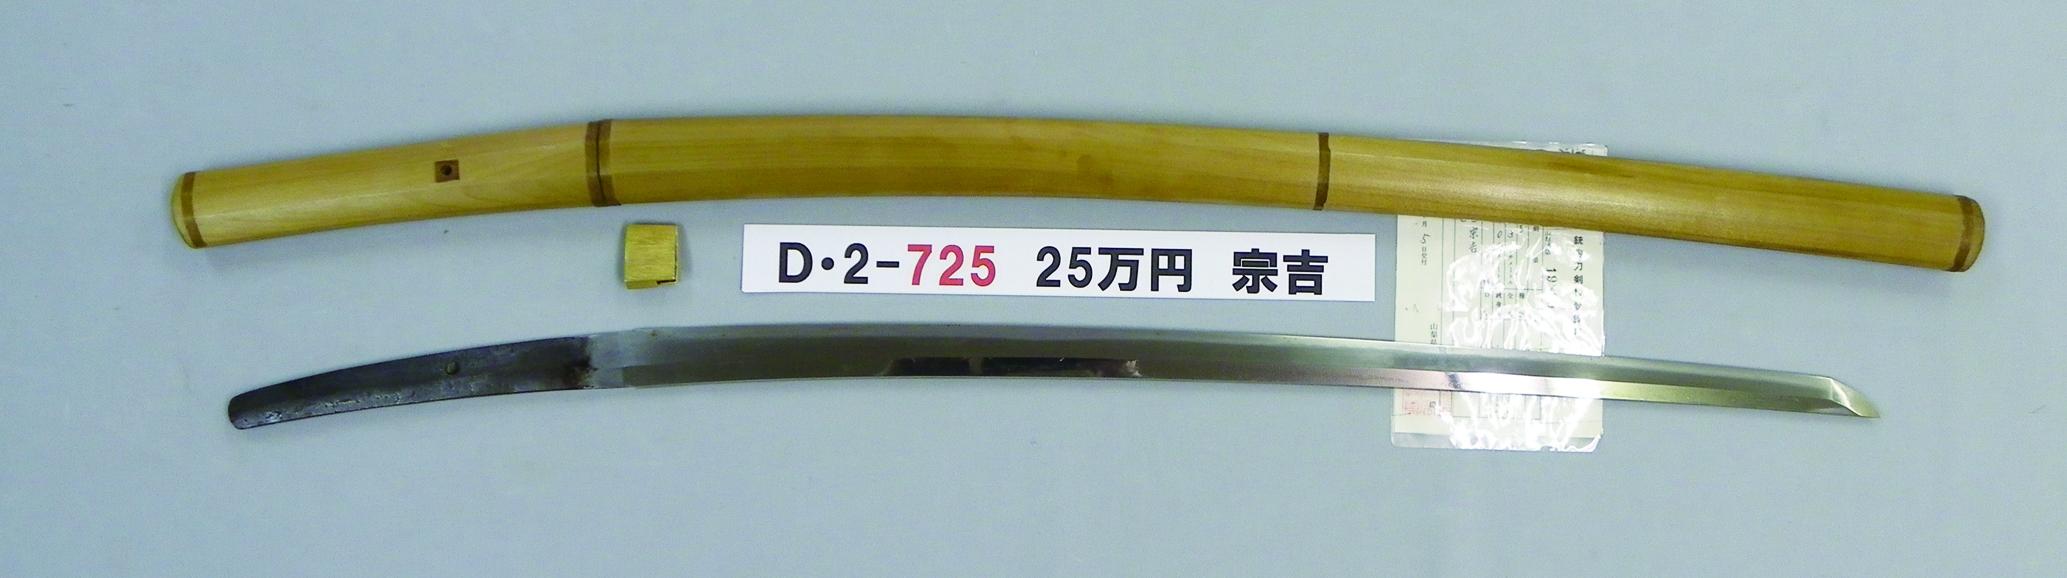 D2725